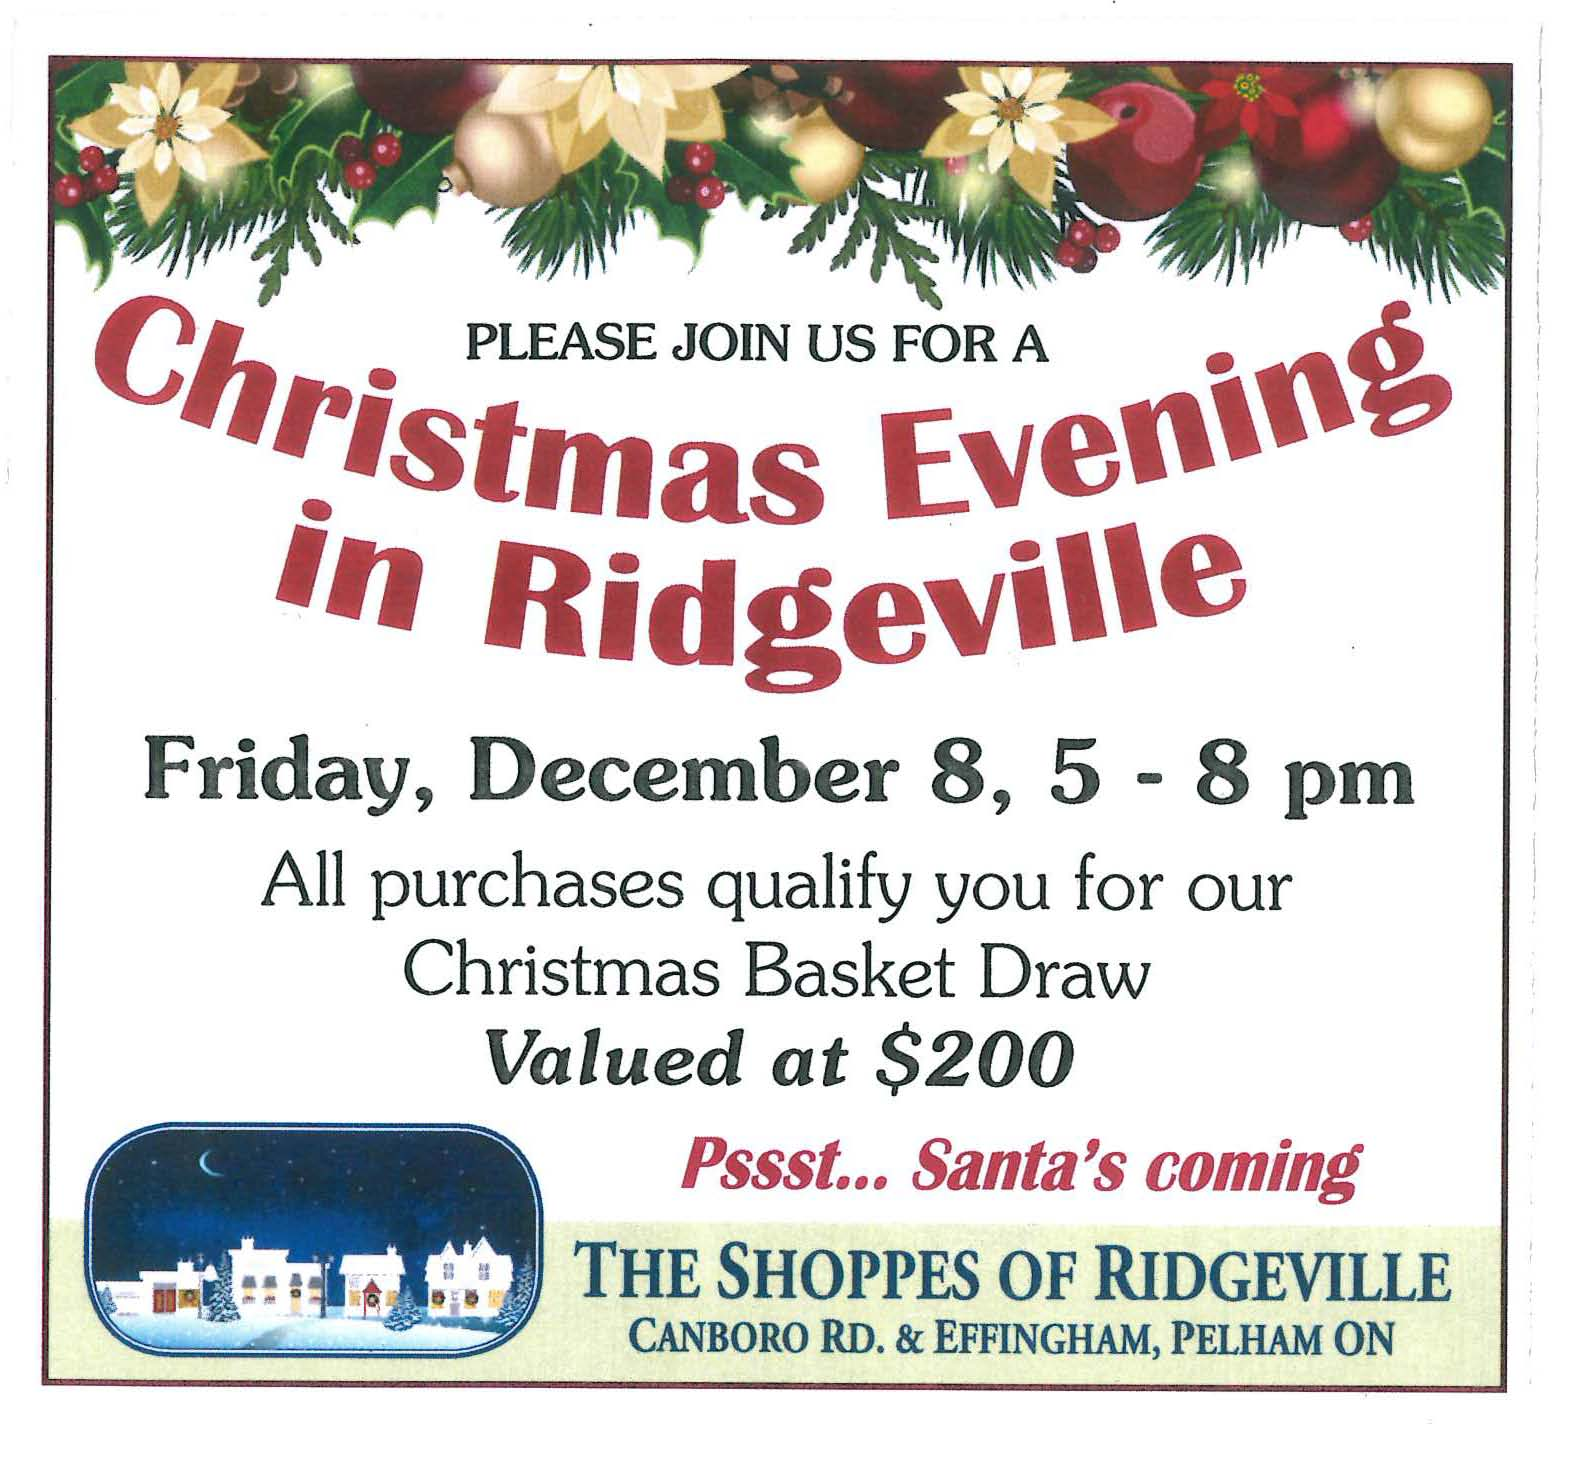 Christmas Evening in Ridgeville